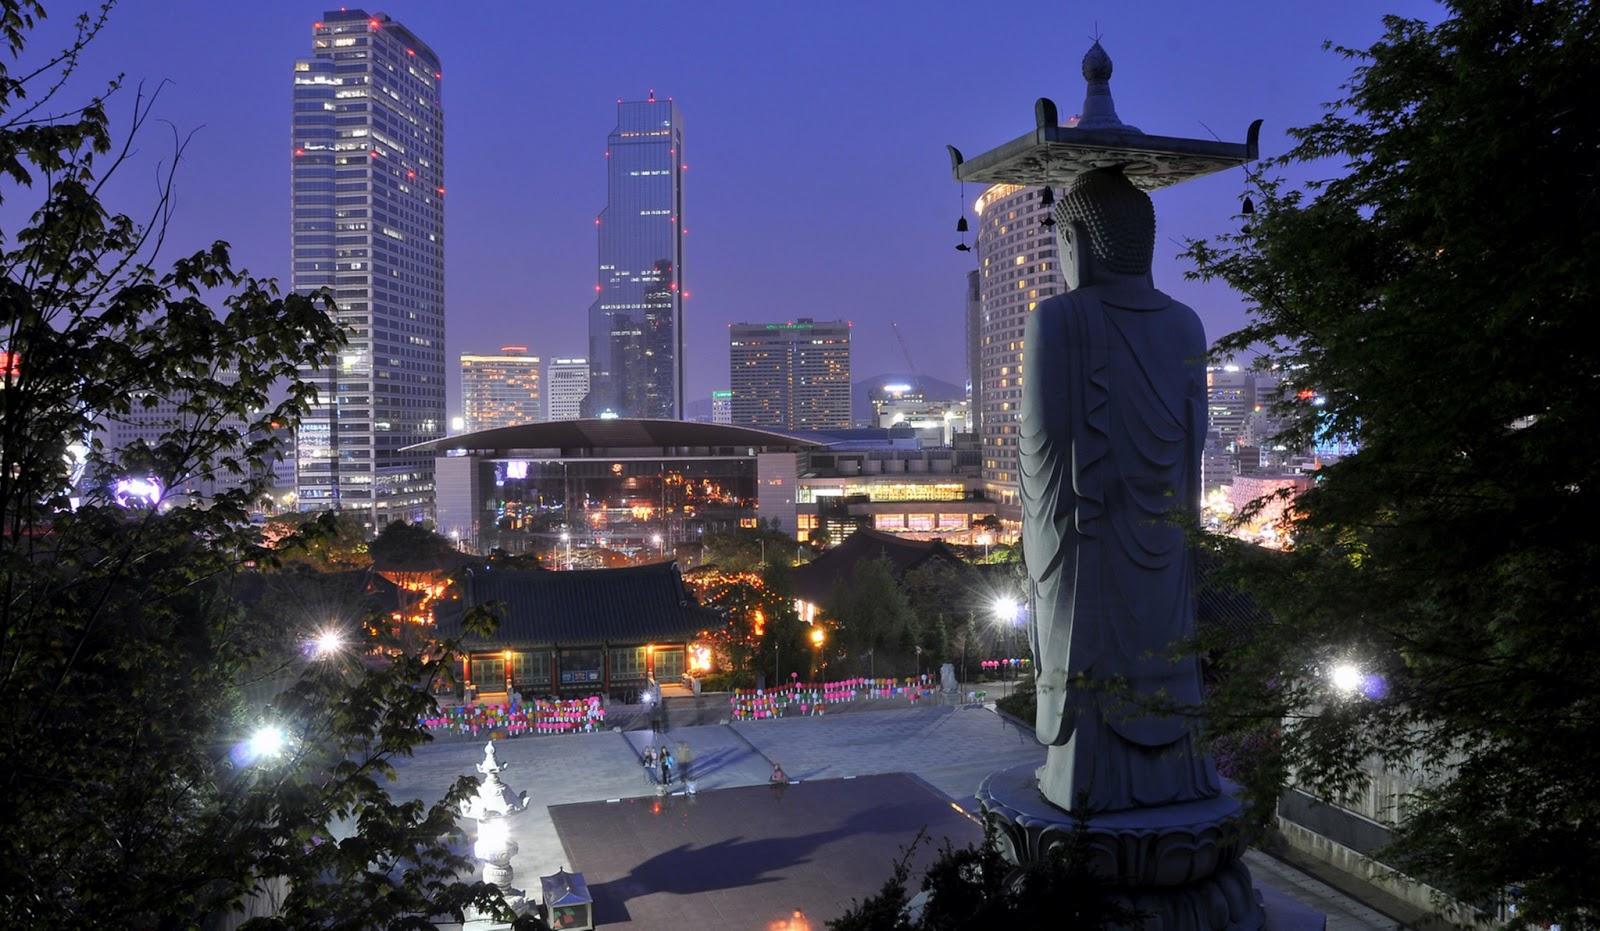 Ulsan South Korea  City new picture : ... to South Korea, Asia Seoul, Busan, Daejeon, Daegu, Incheon, Ulsan